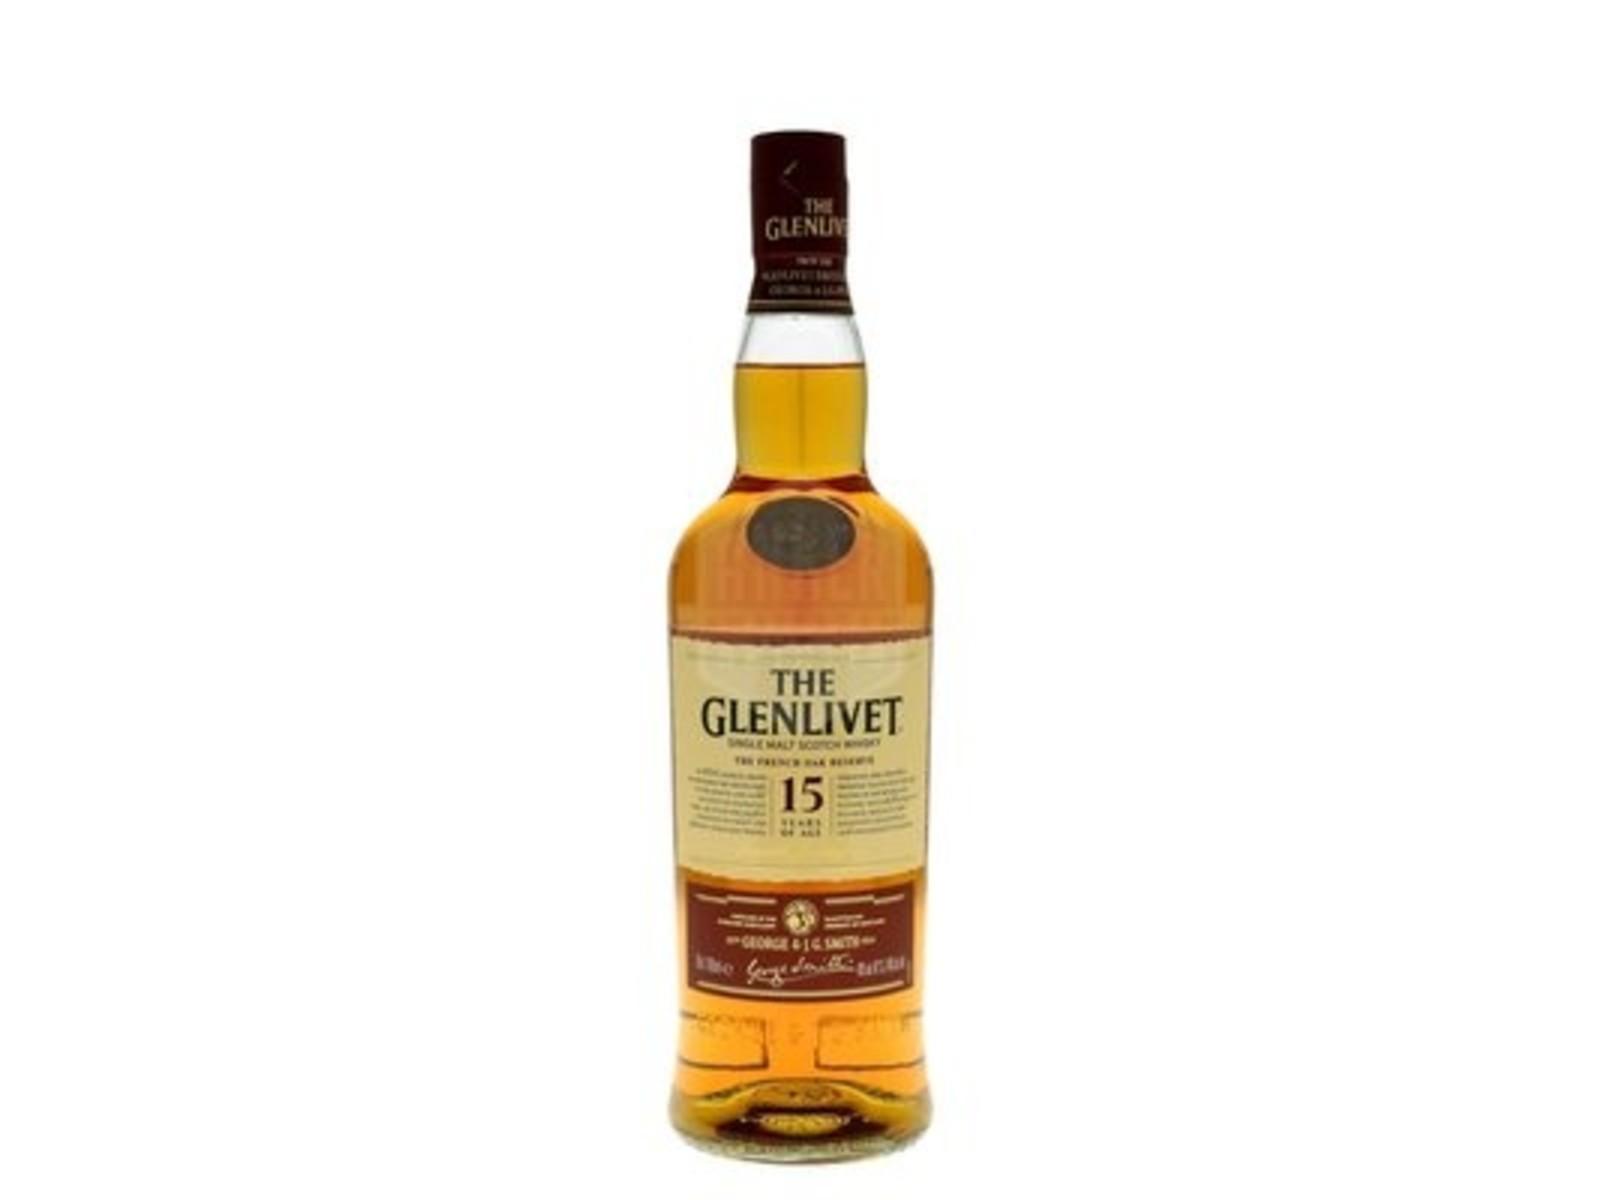 The Glenlivet The Glenlivet 15 Years French Oak